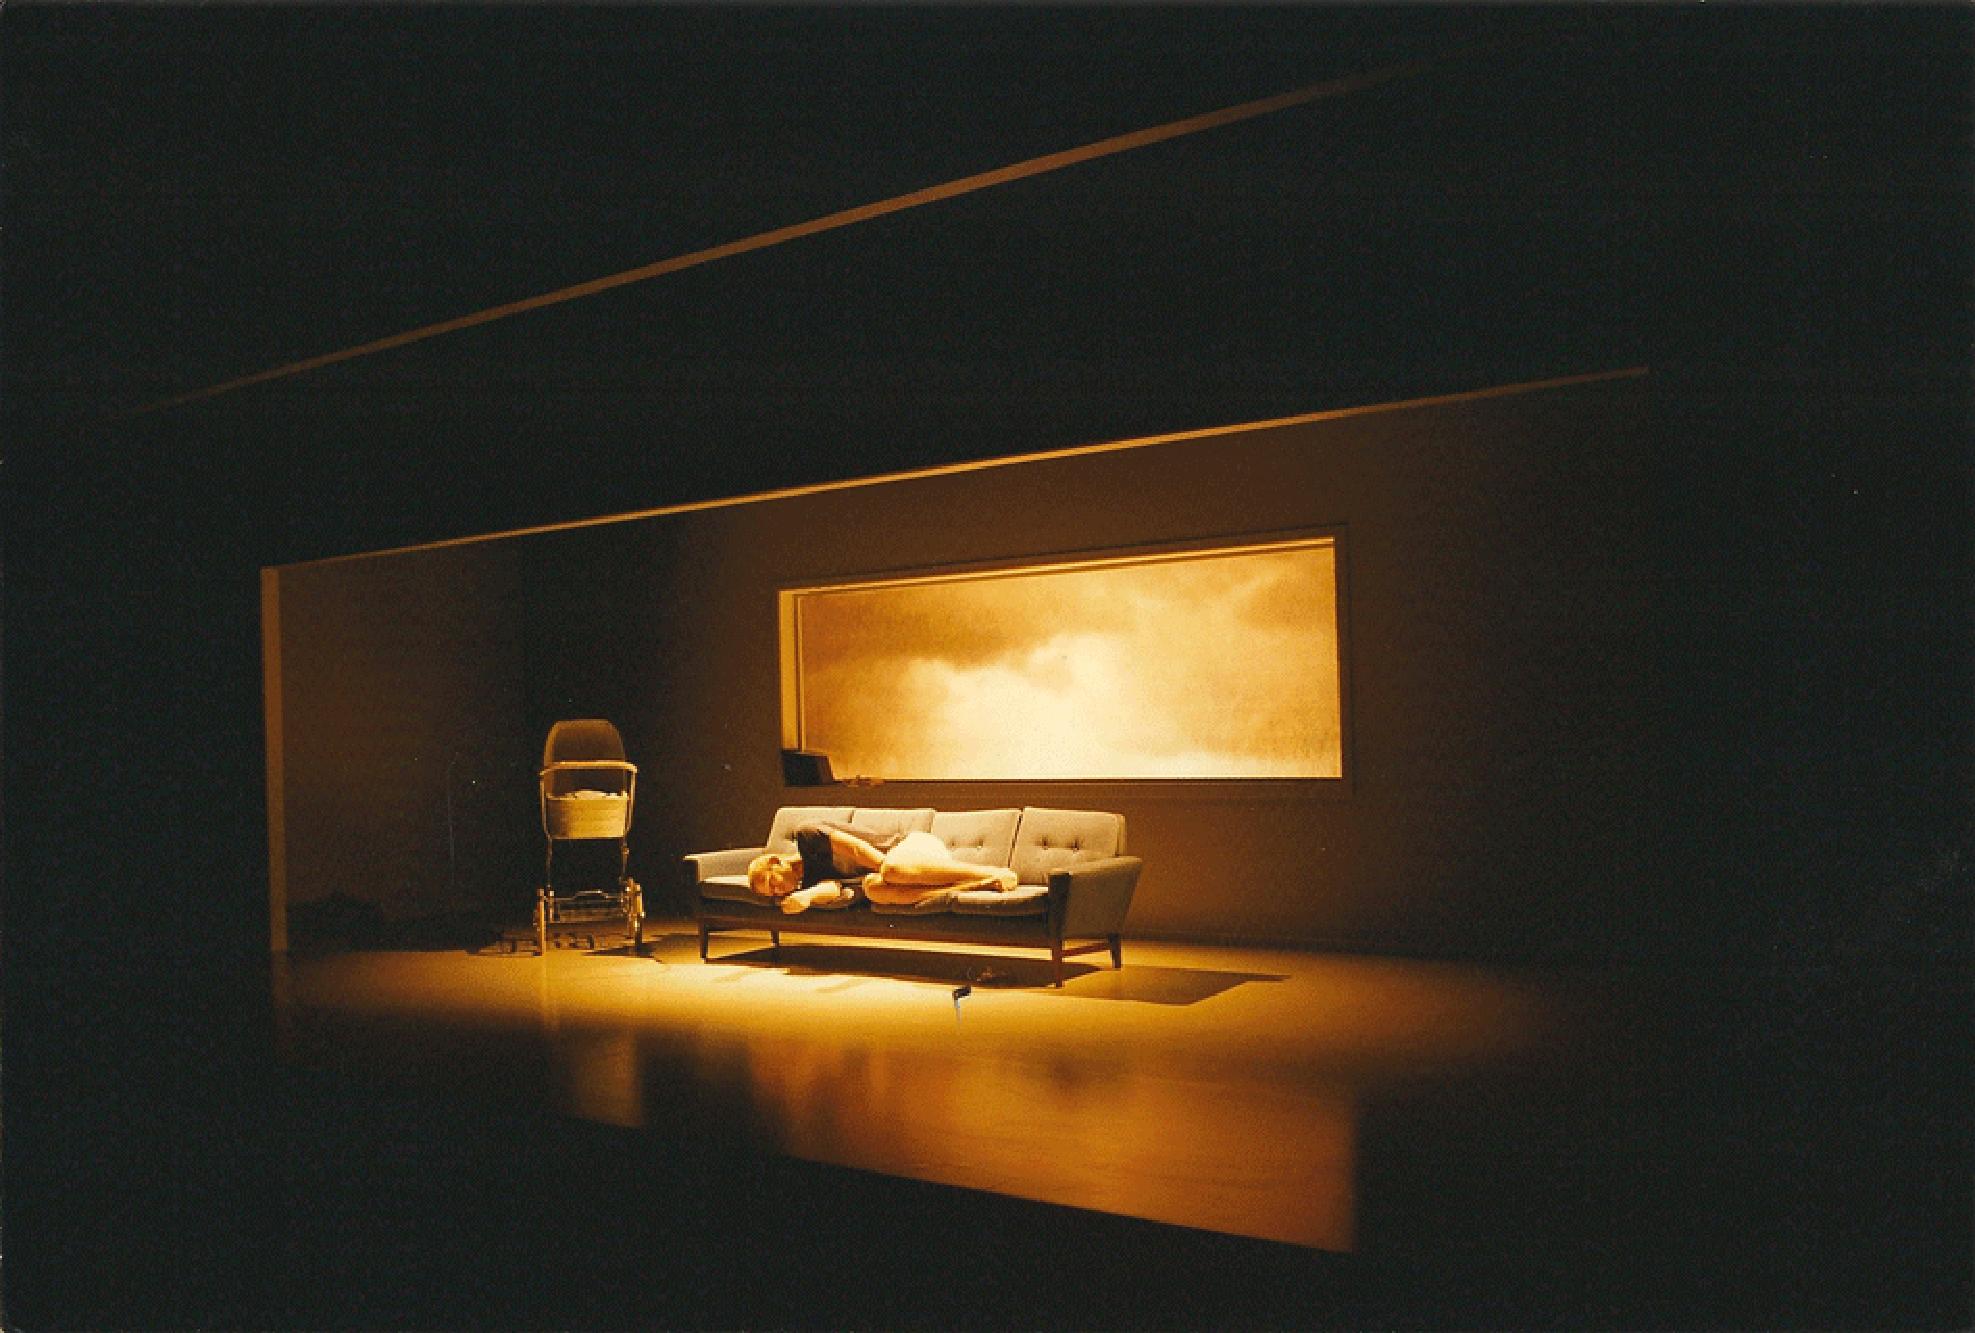 natta-syng-sine-songar-1.jpg